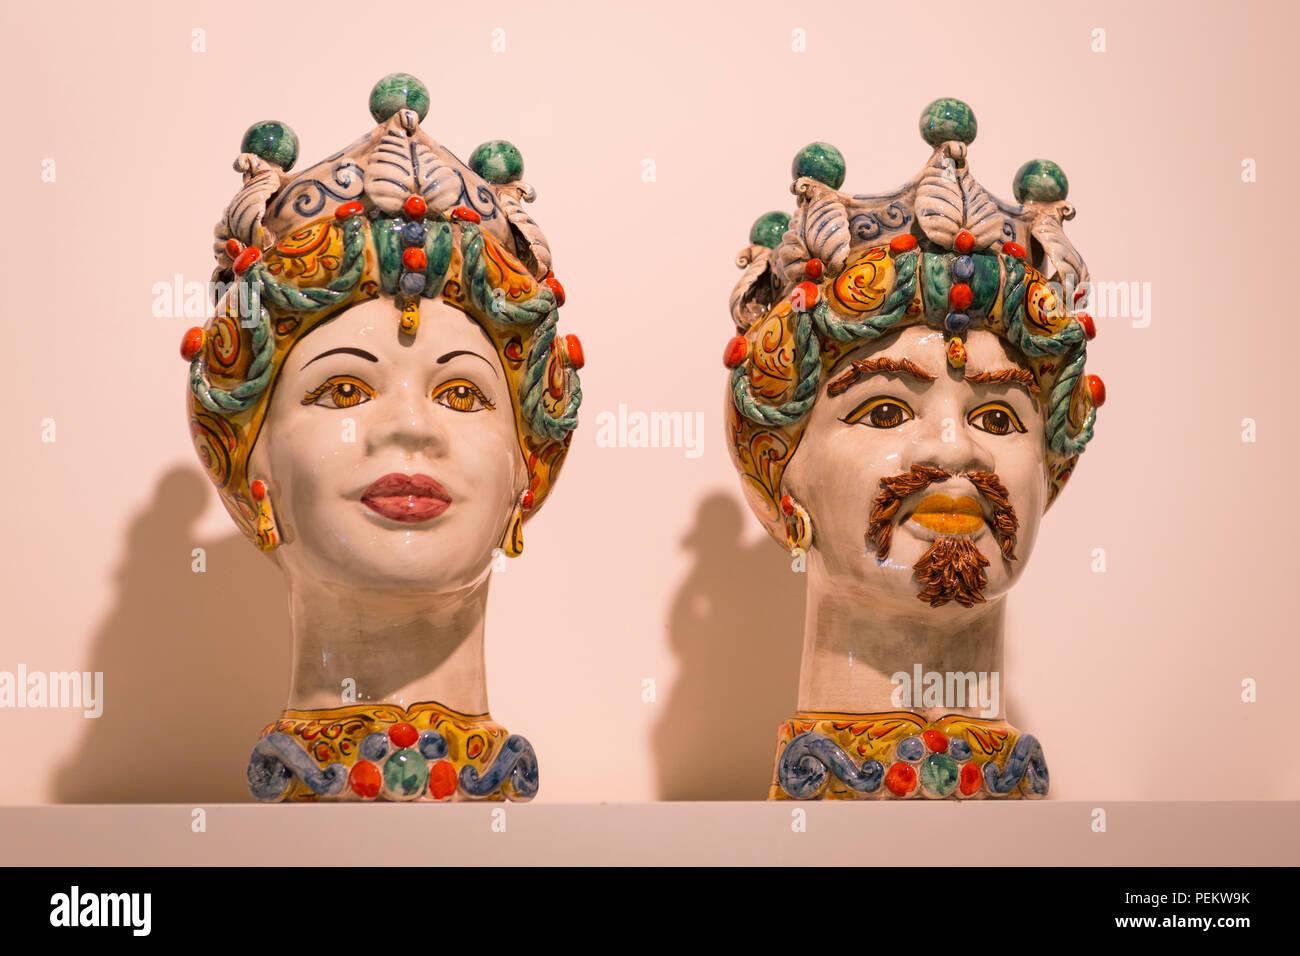 Italy Sicily Syracuse Siracusa Ortygia traditional heads busts Maiolica pottery Sicilian ceramic art Sicilian XI century legend decapitated head - Stock Image